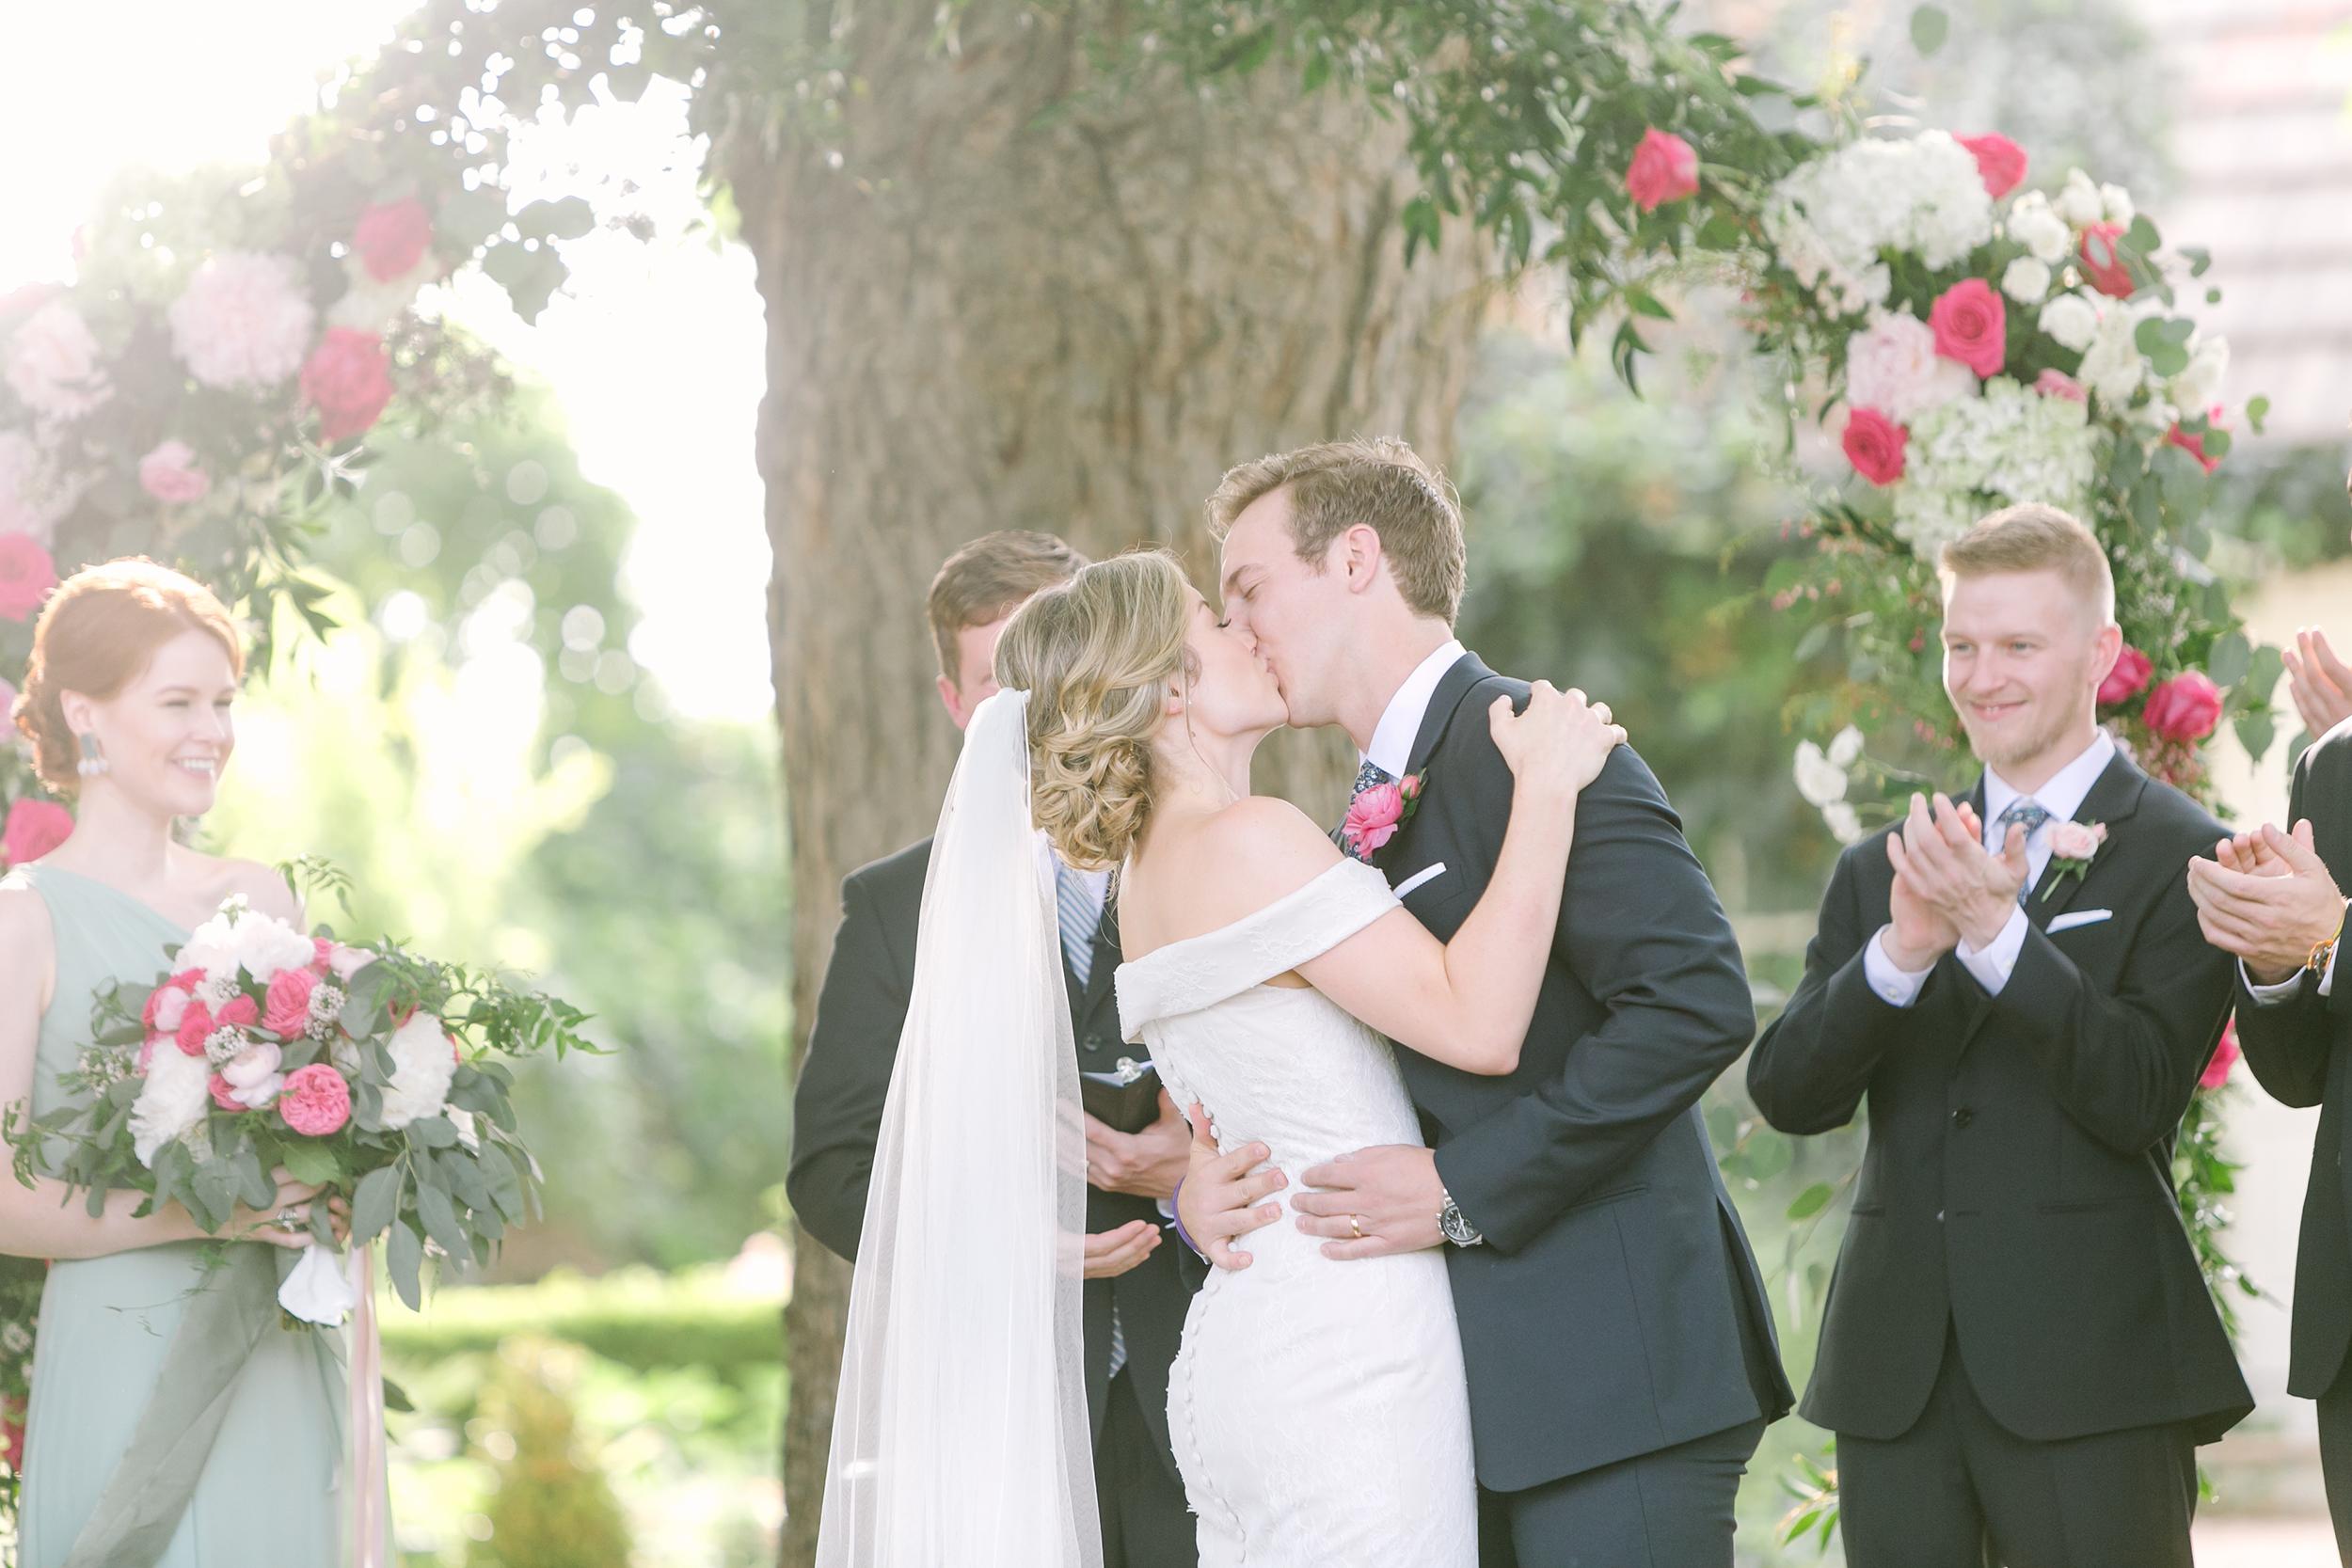 Austin_Wedding_Photographer_Kimberly_Brooke_Photographic_116.jpg